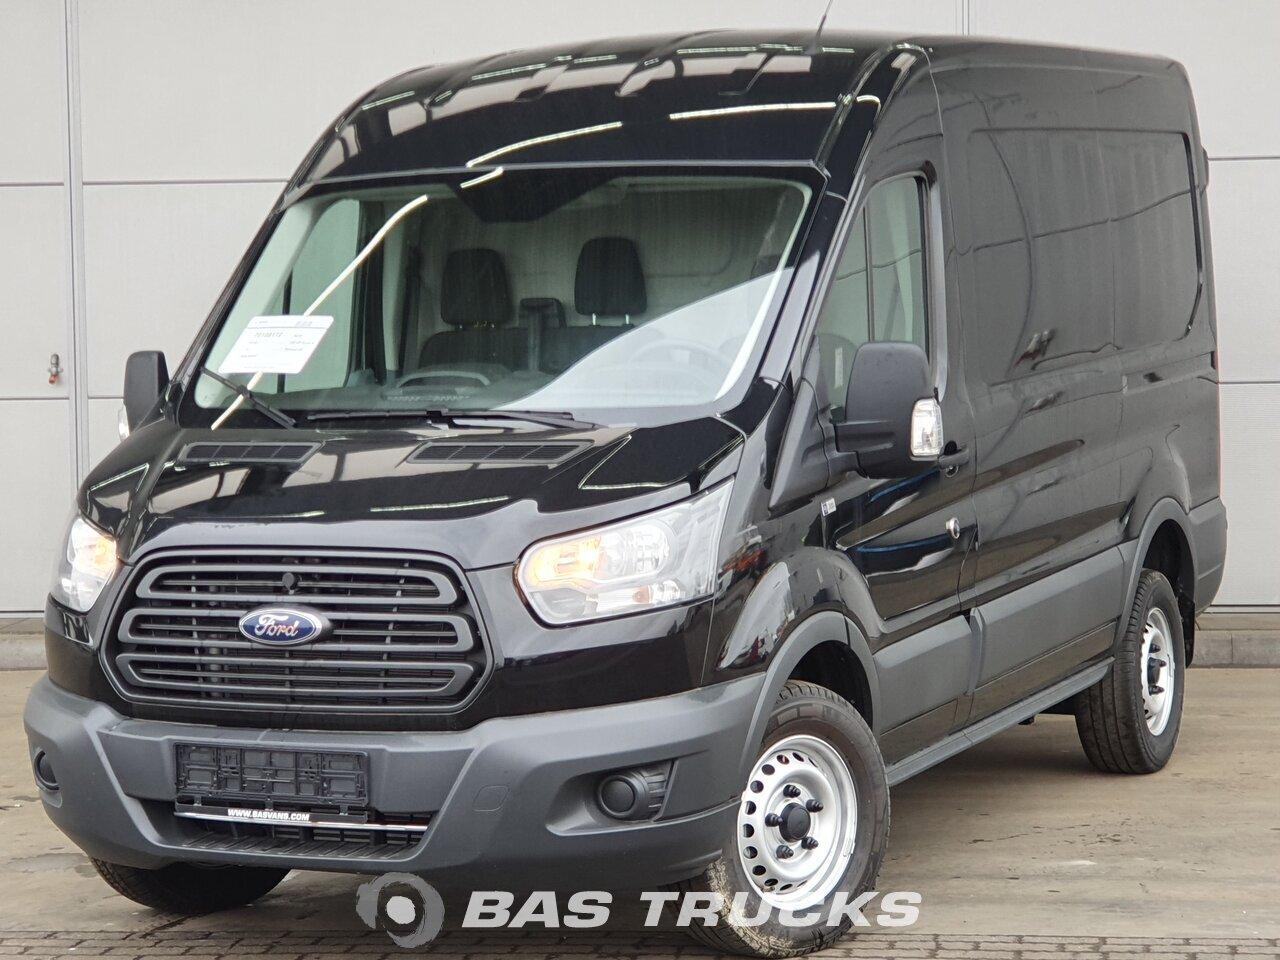 Ford Transit 06 2019 Bas Trucks